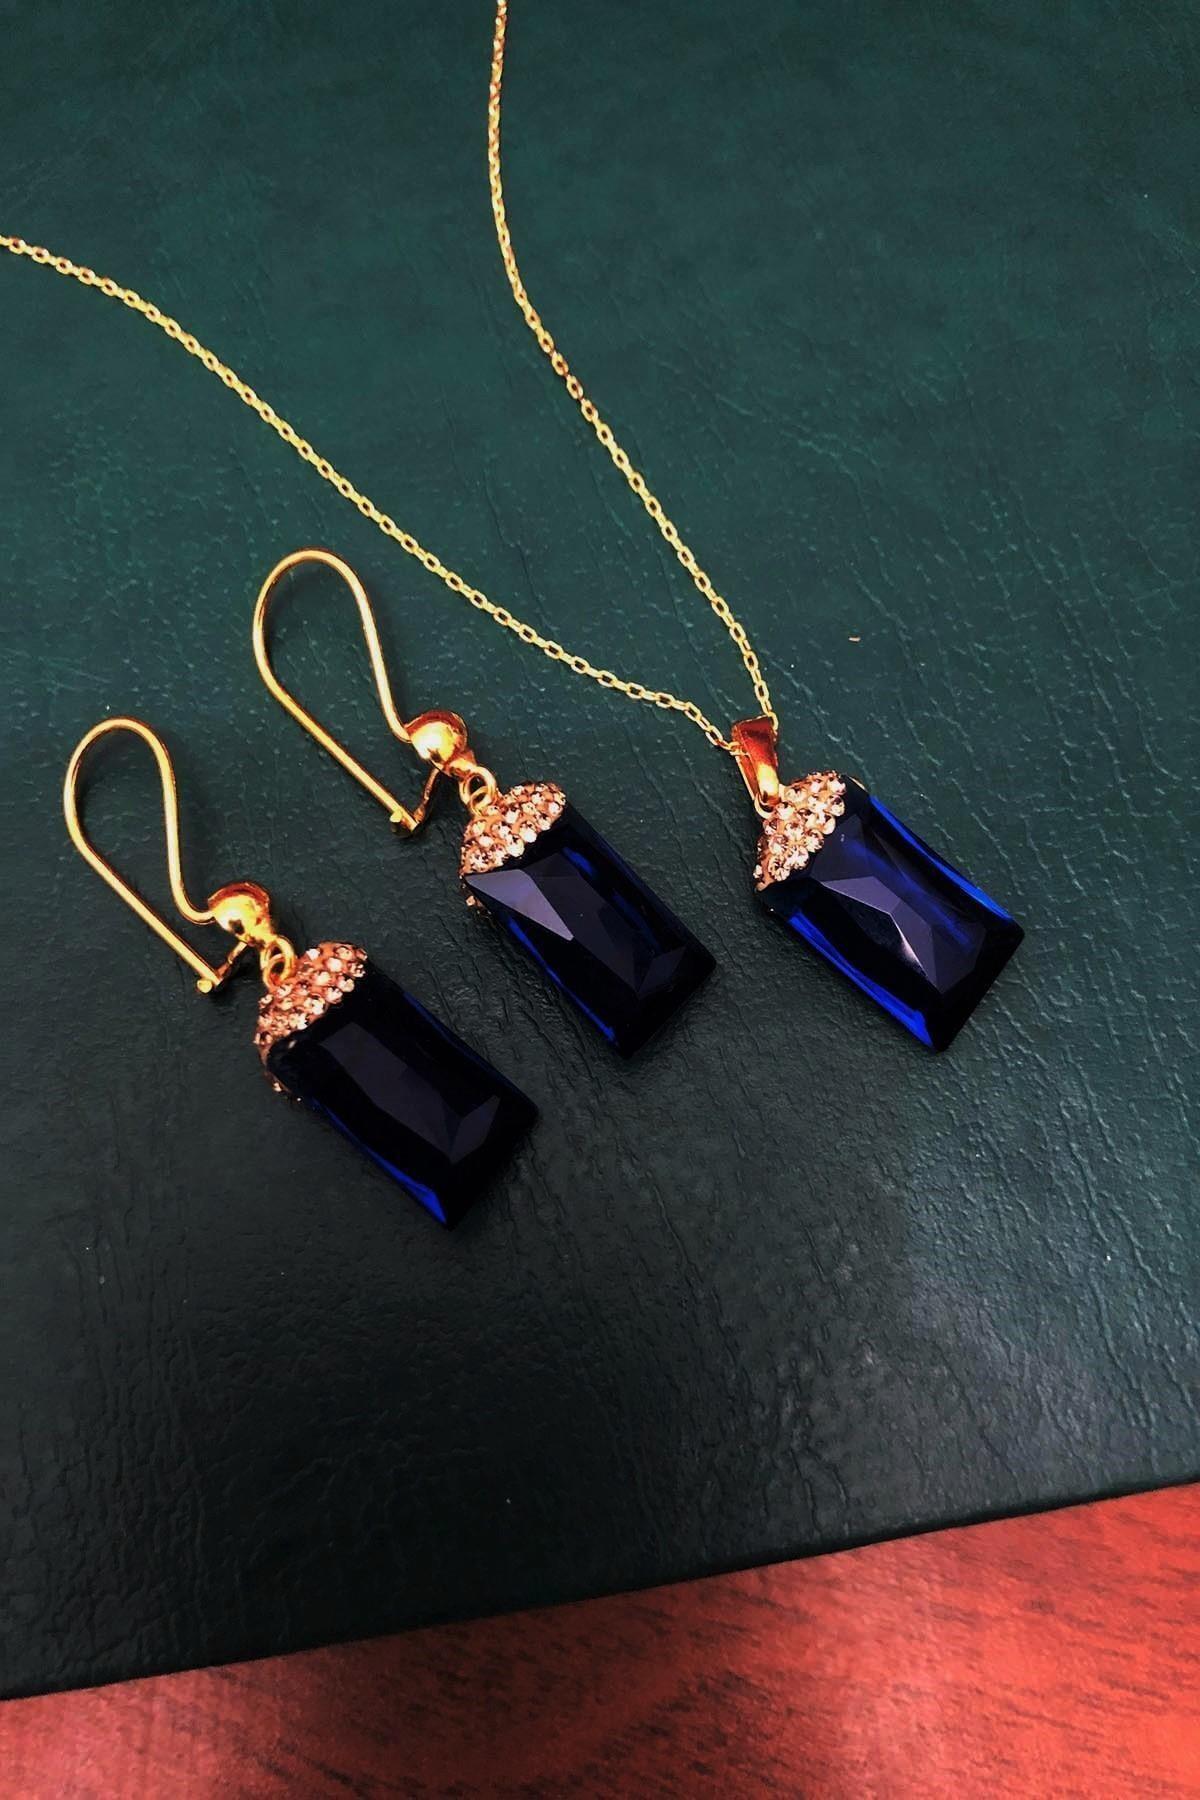 Dr. Stone Safir Rengi Hindistan Kristali Gümüş Set Xdrsott12 1